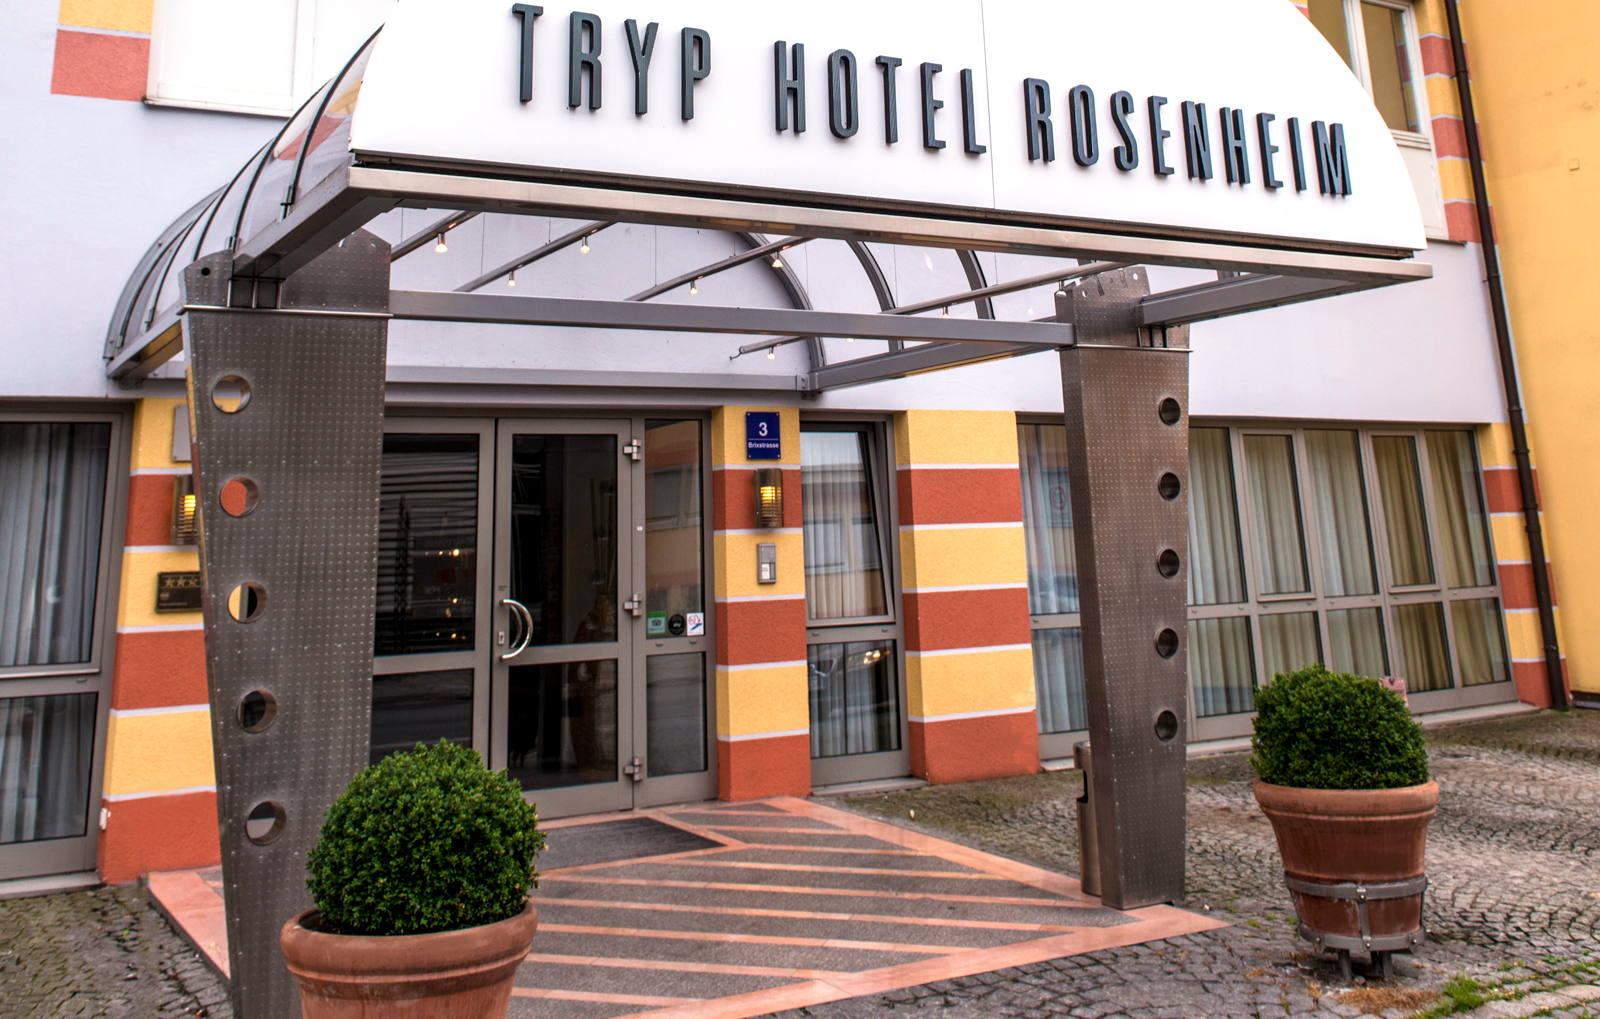 thermen-spa-hotels-rosenheim-bg6